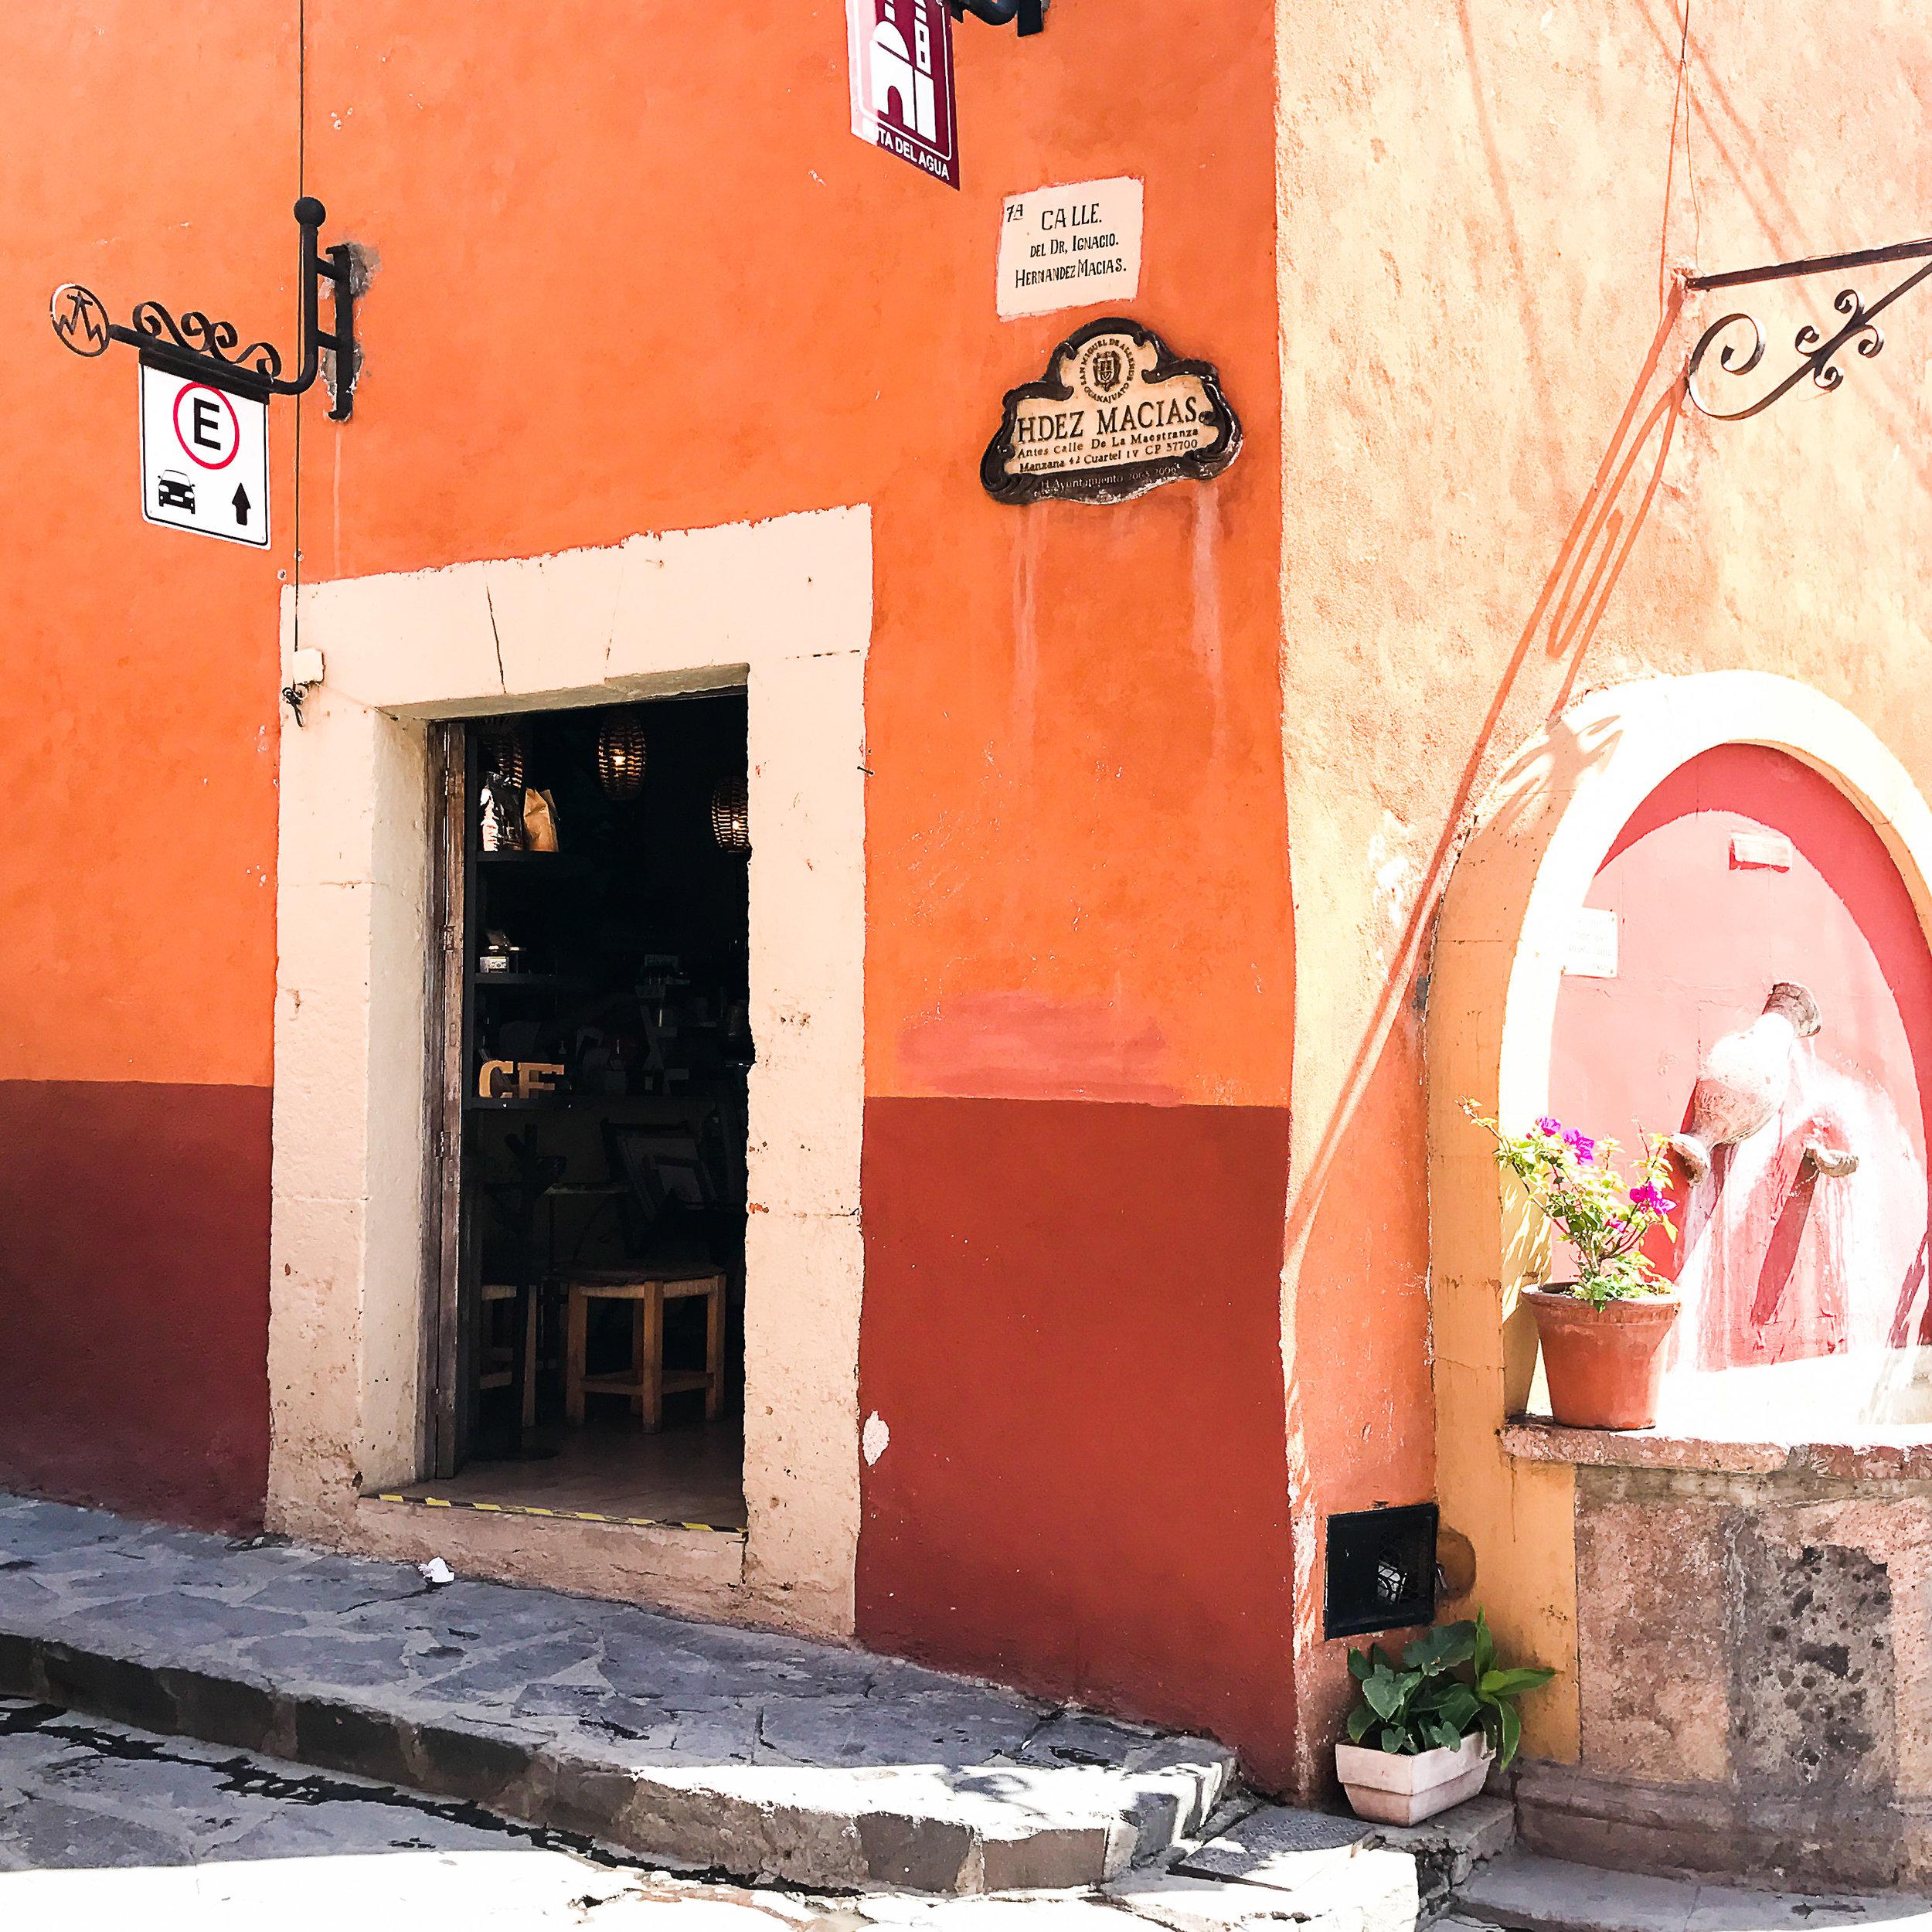 mexican-food-san-miguel-de-allende-restuarants-coffee-cafes-3.jpg